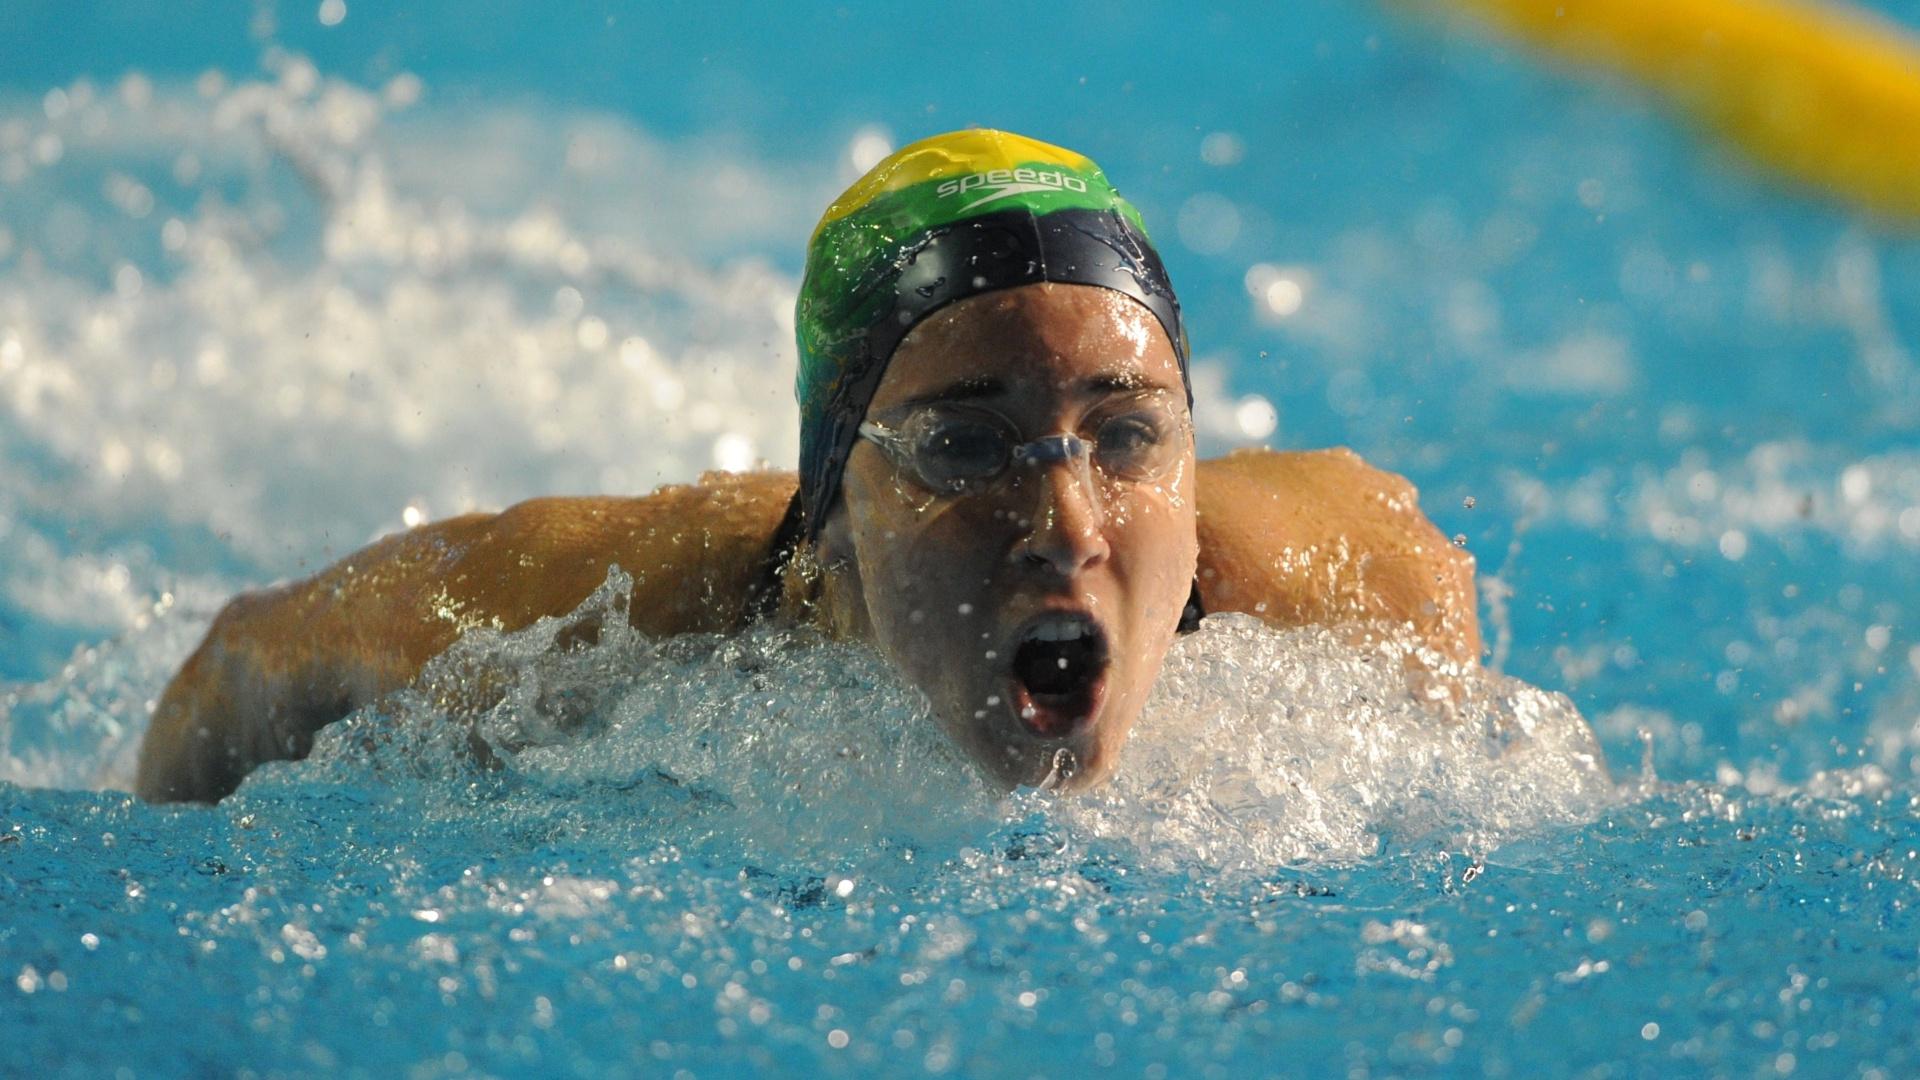 A brasileira Gabriella Silva reclama da altitude e disse ter tido fobia durante a disputa dos 100m borboleta (15/10/2011)